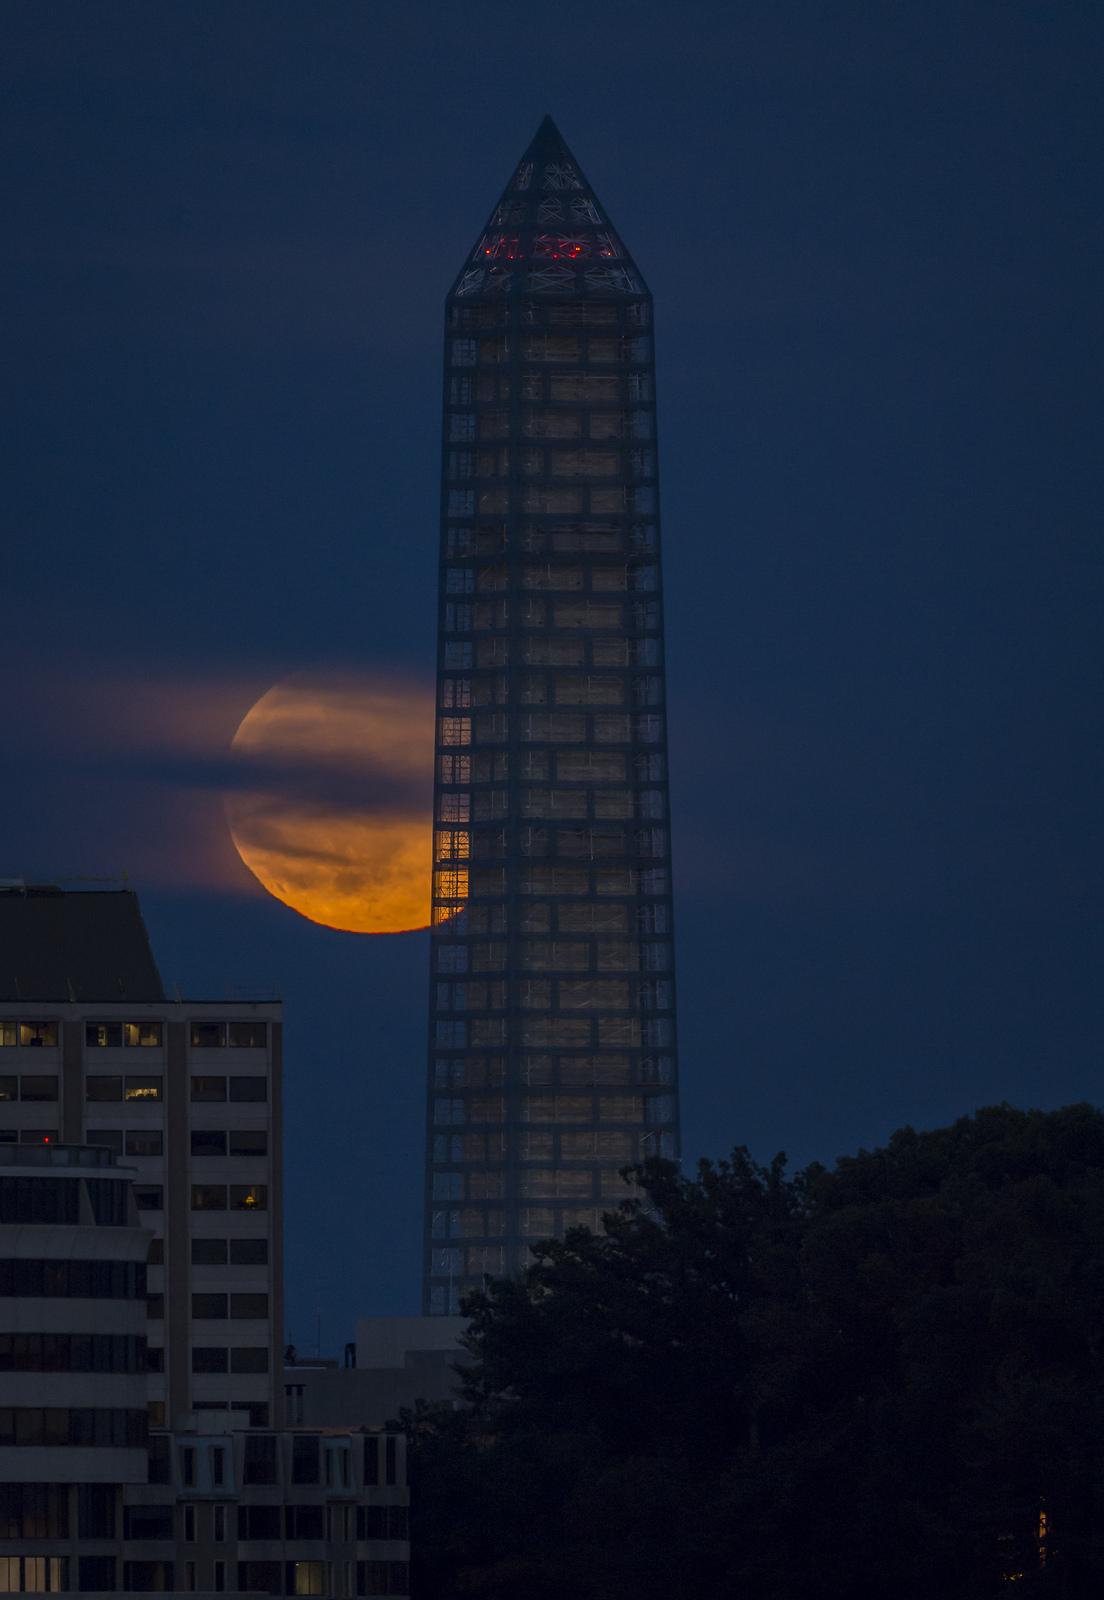 Supermoon Rises Behind Washington Monument